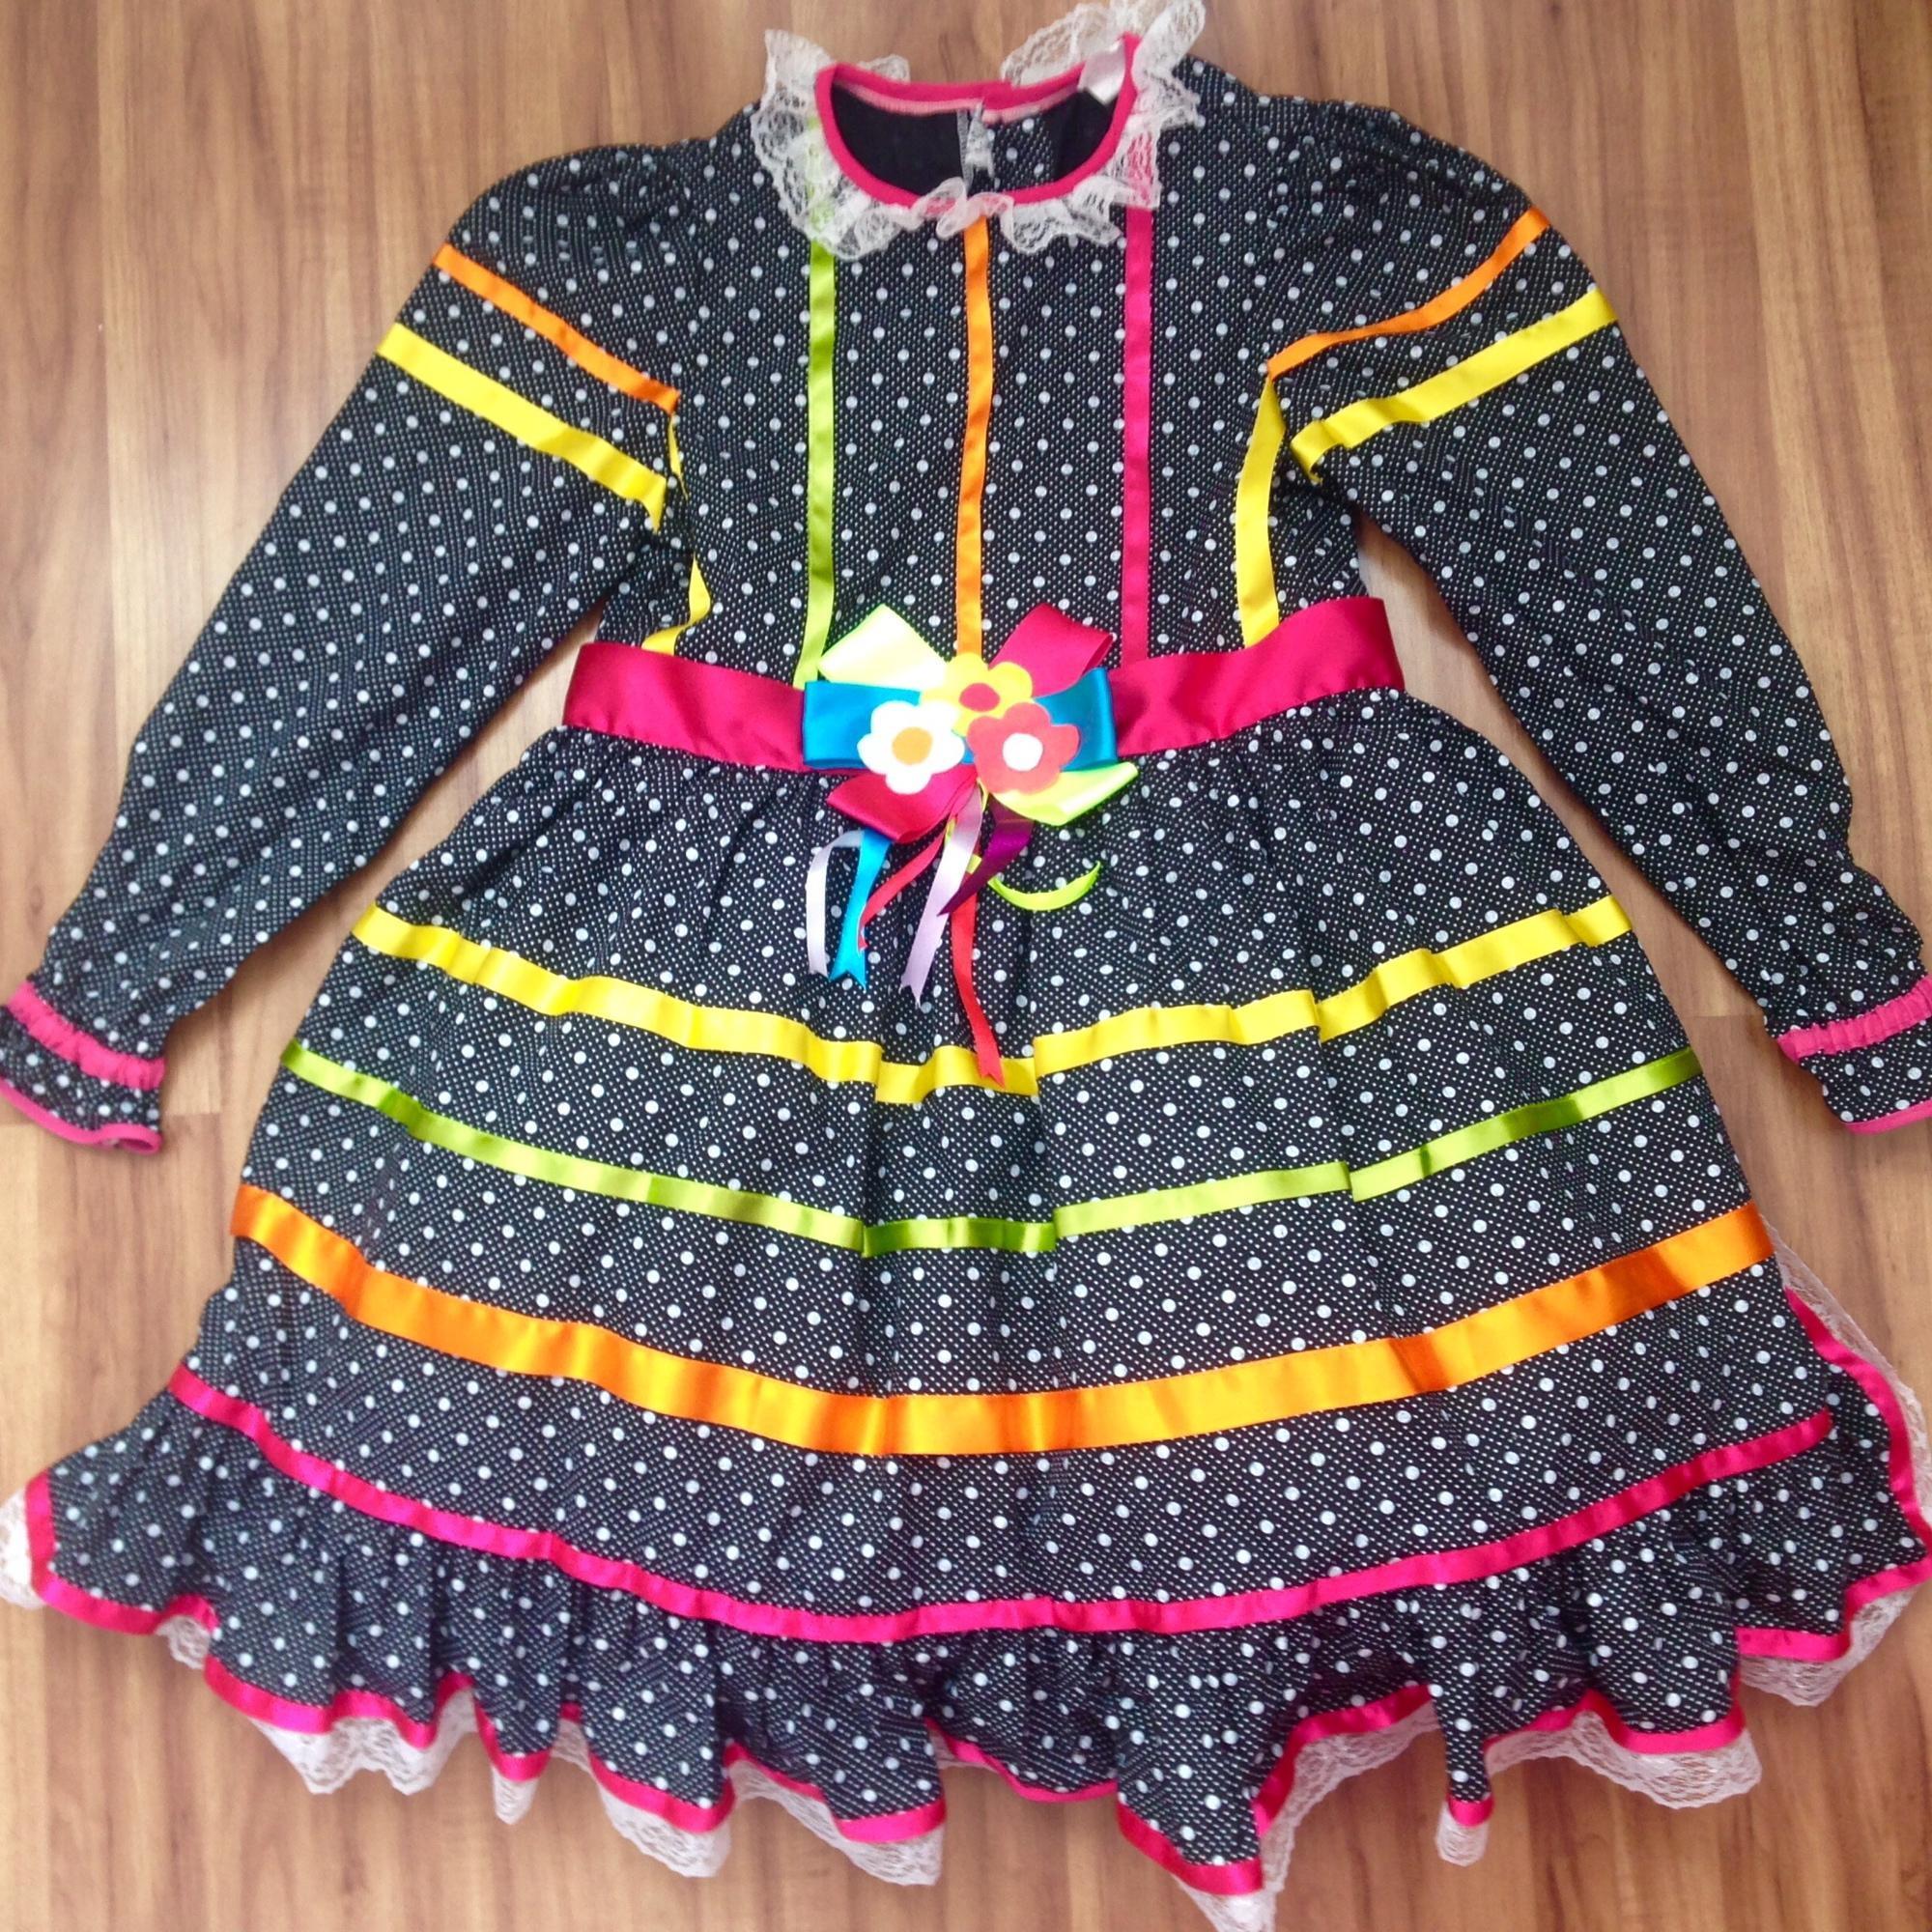 Vestido de festa junina em juiz de fora